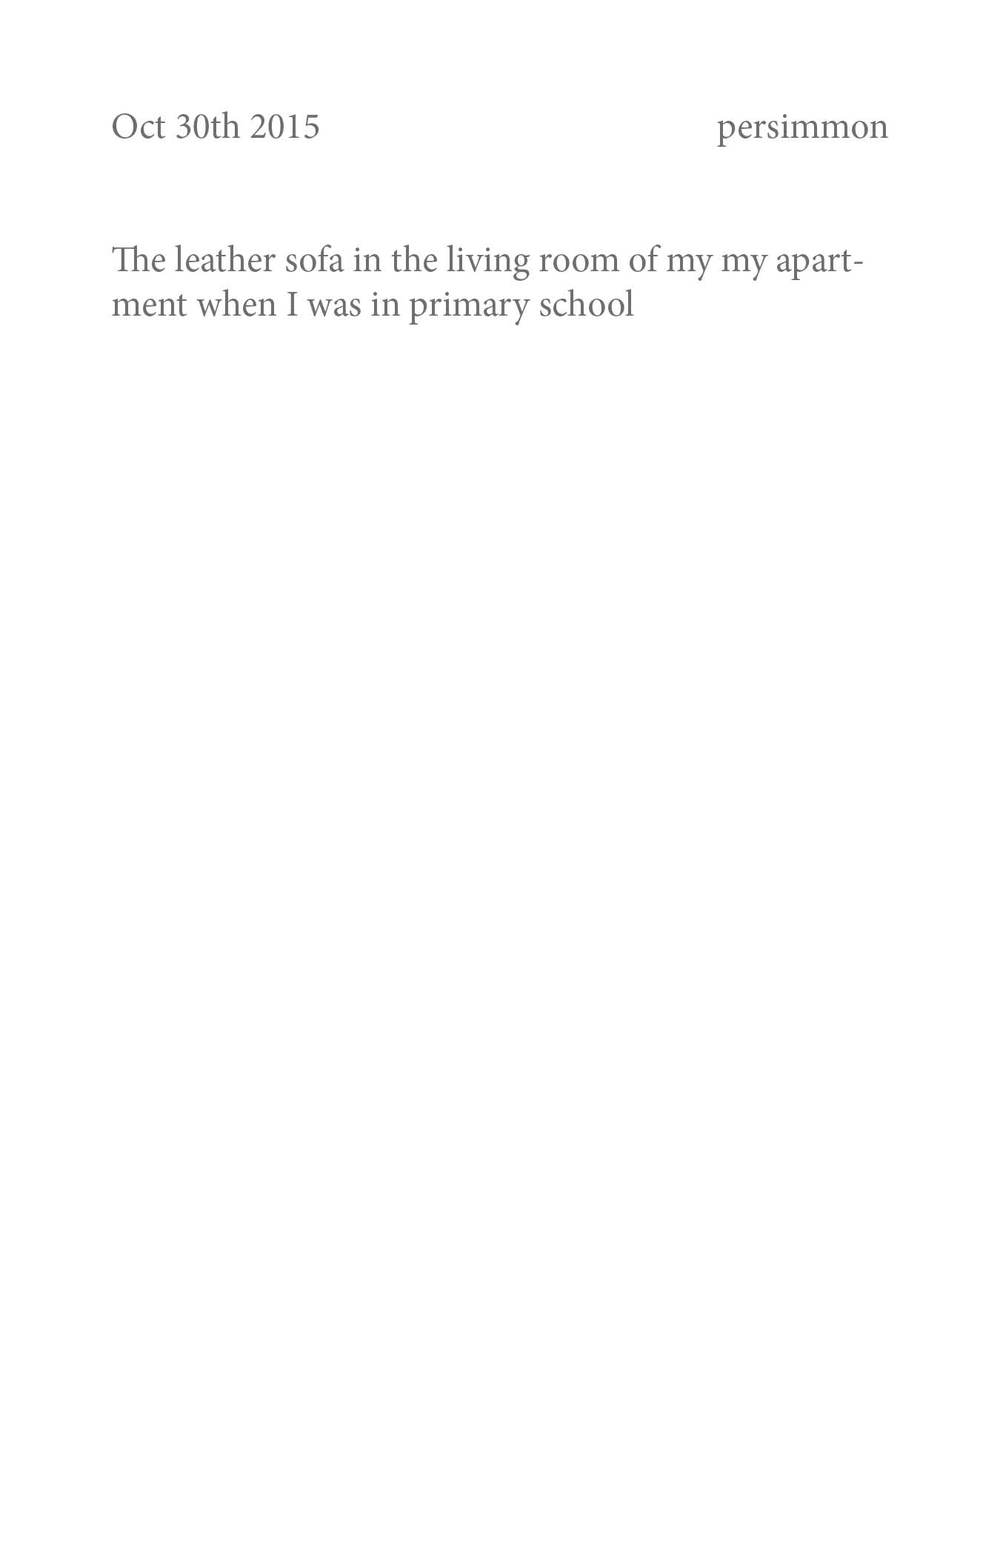 reflection writing_book21.jpg